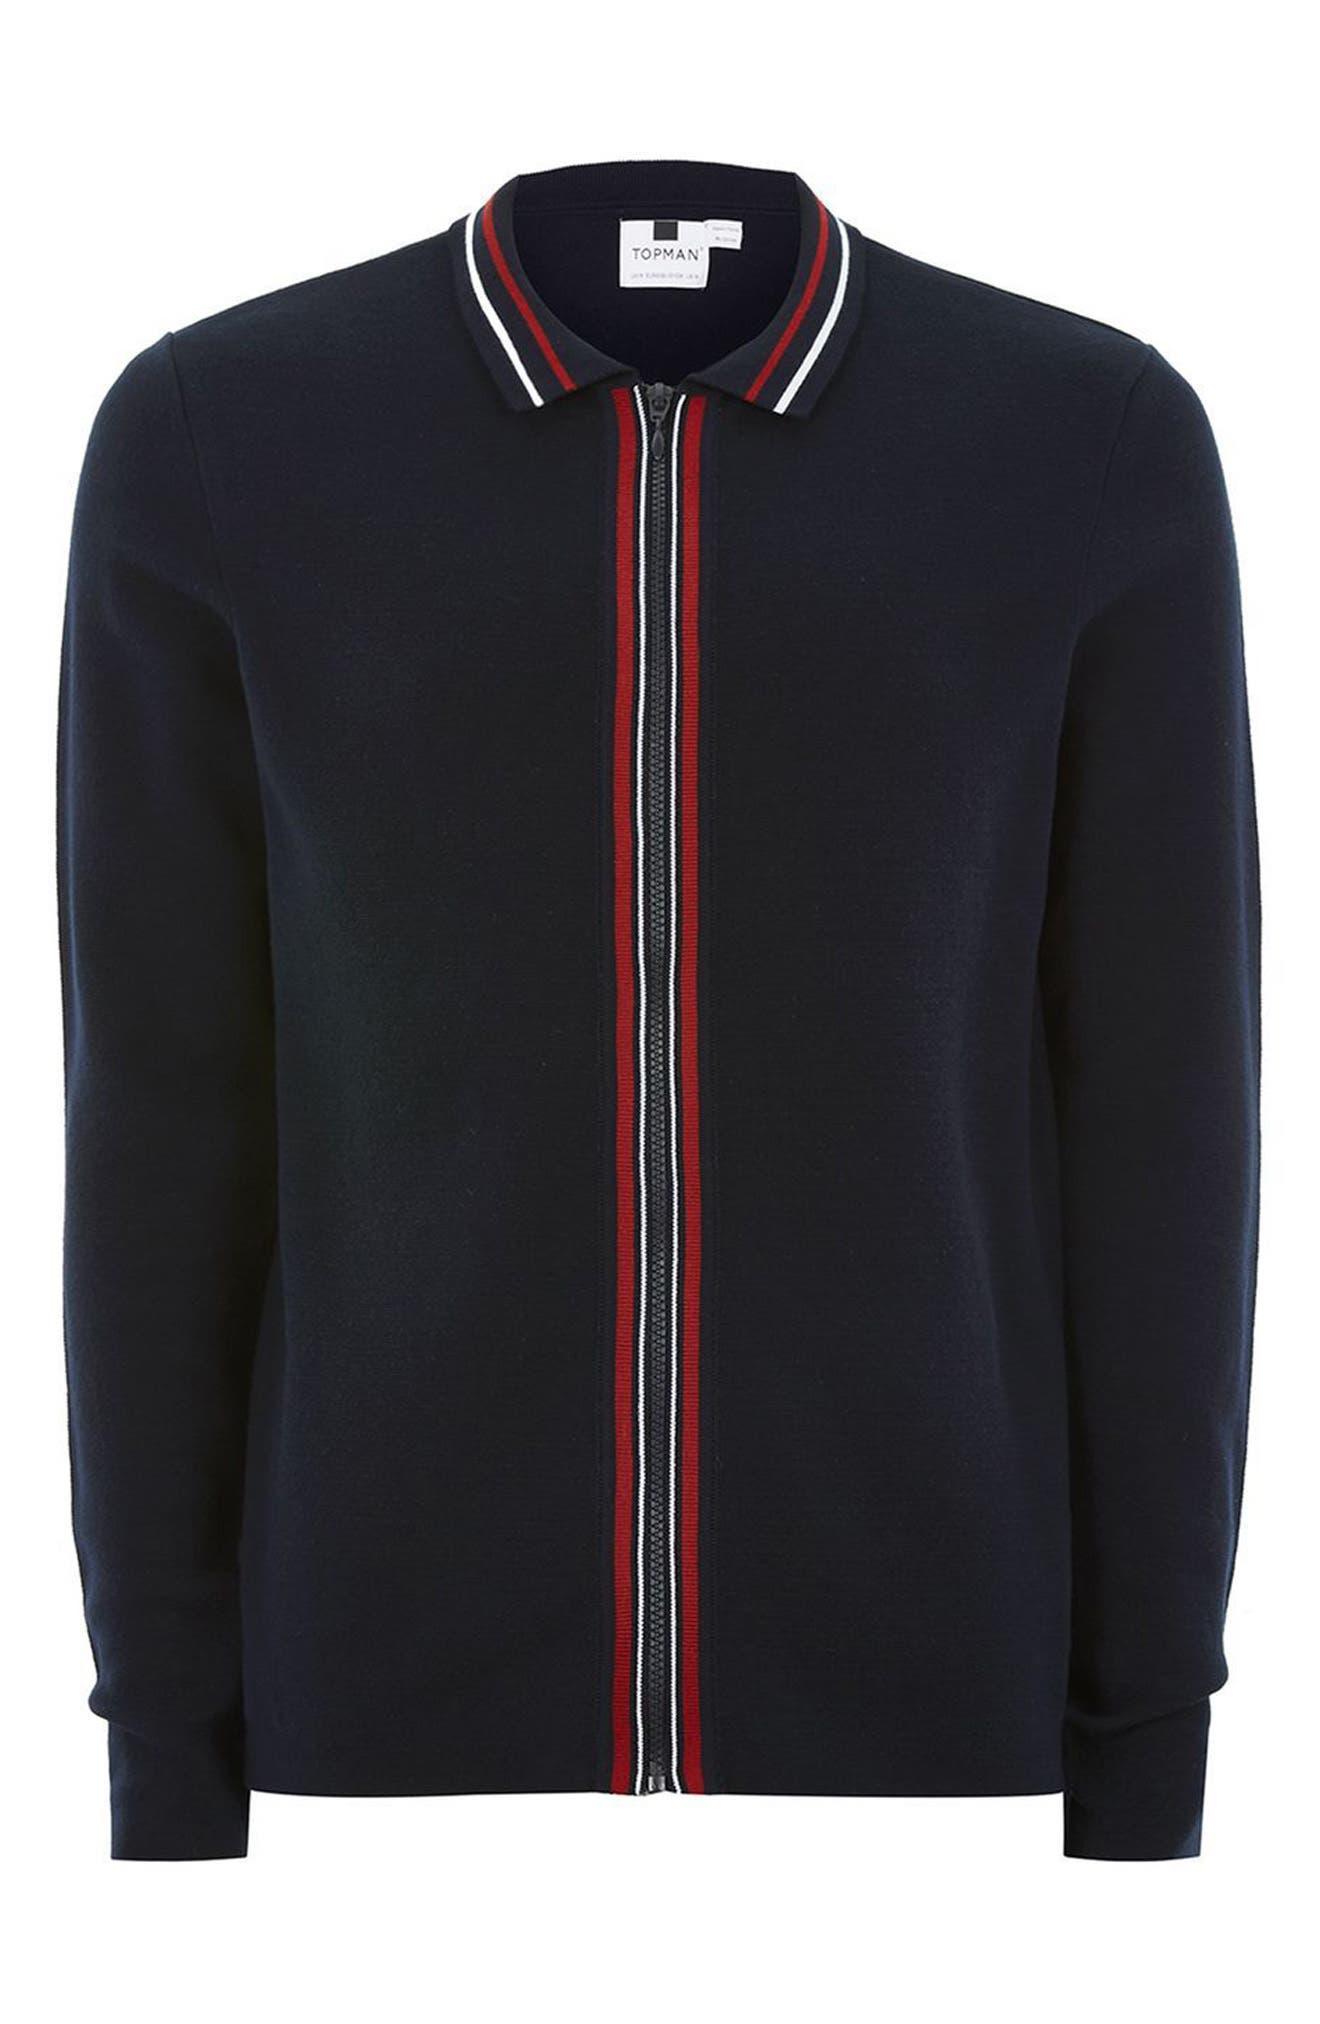 TOPMAN,                             Stripe Knit Zip Front Harrington Sweatshirt,                             Alternate thumbnail 4, color,                             410